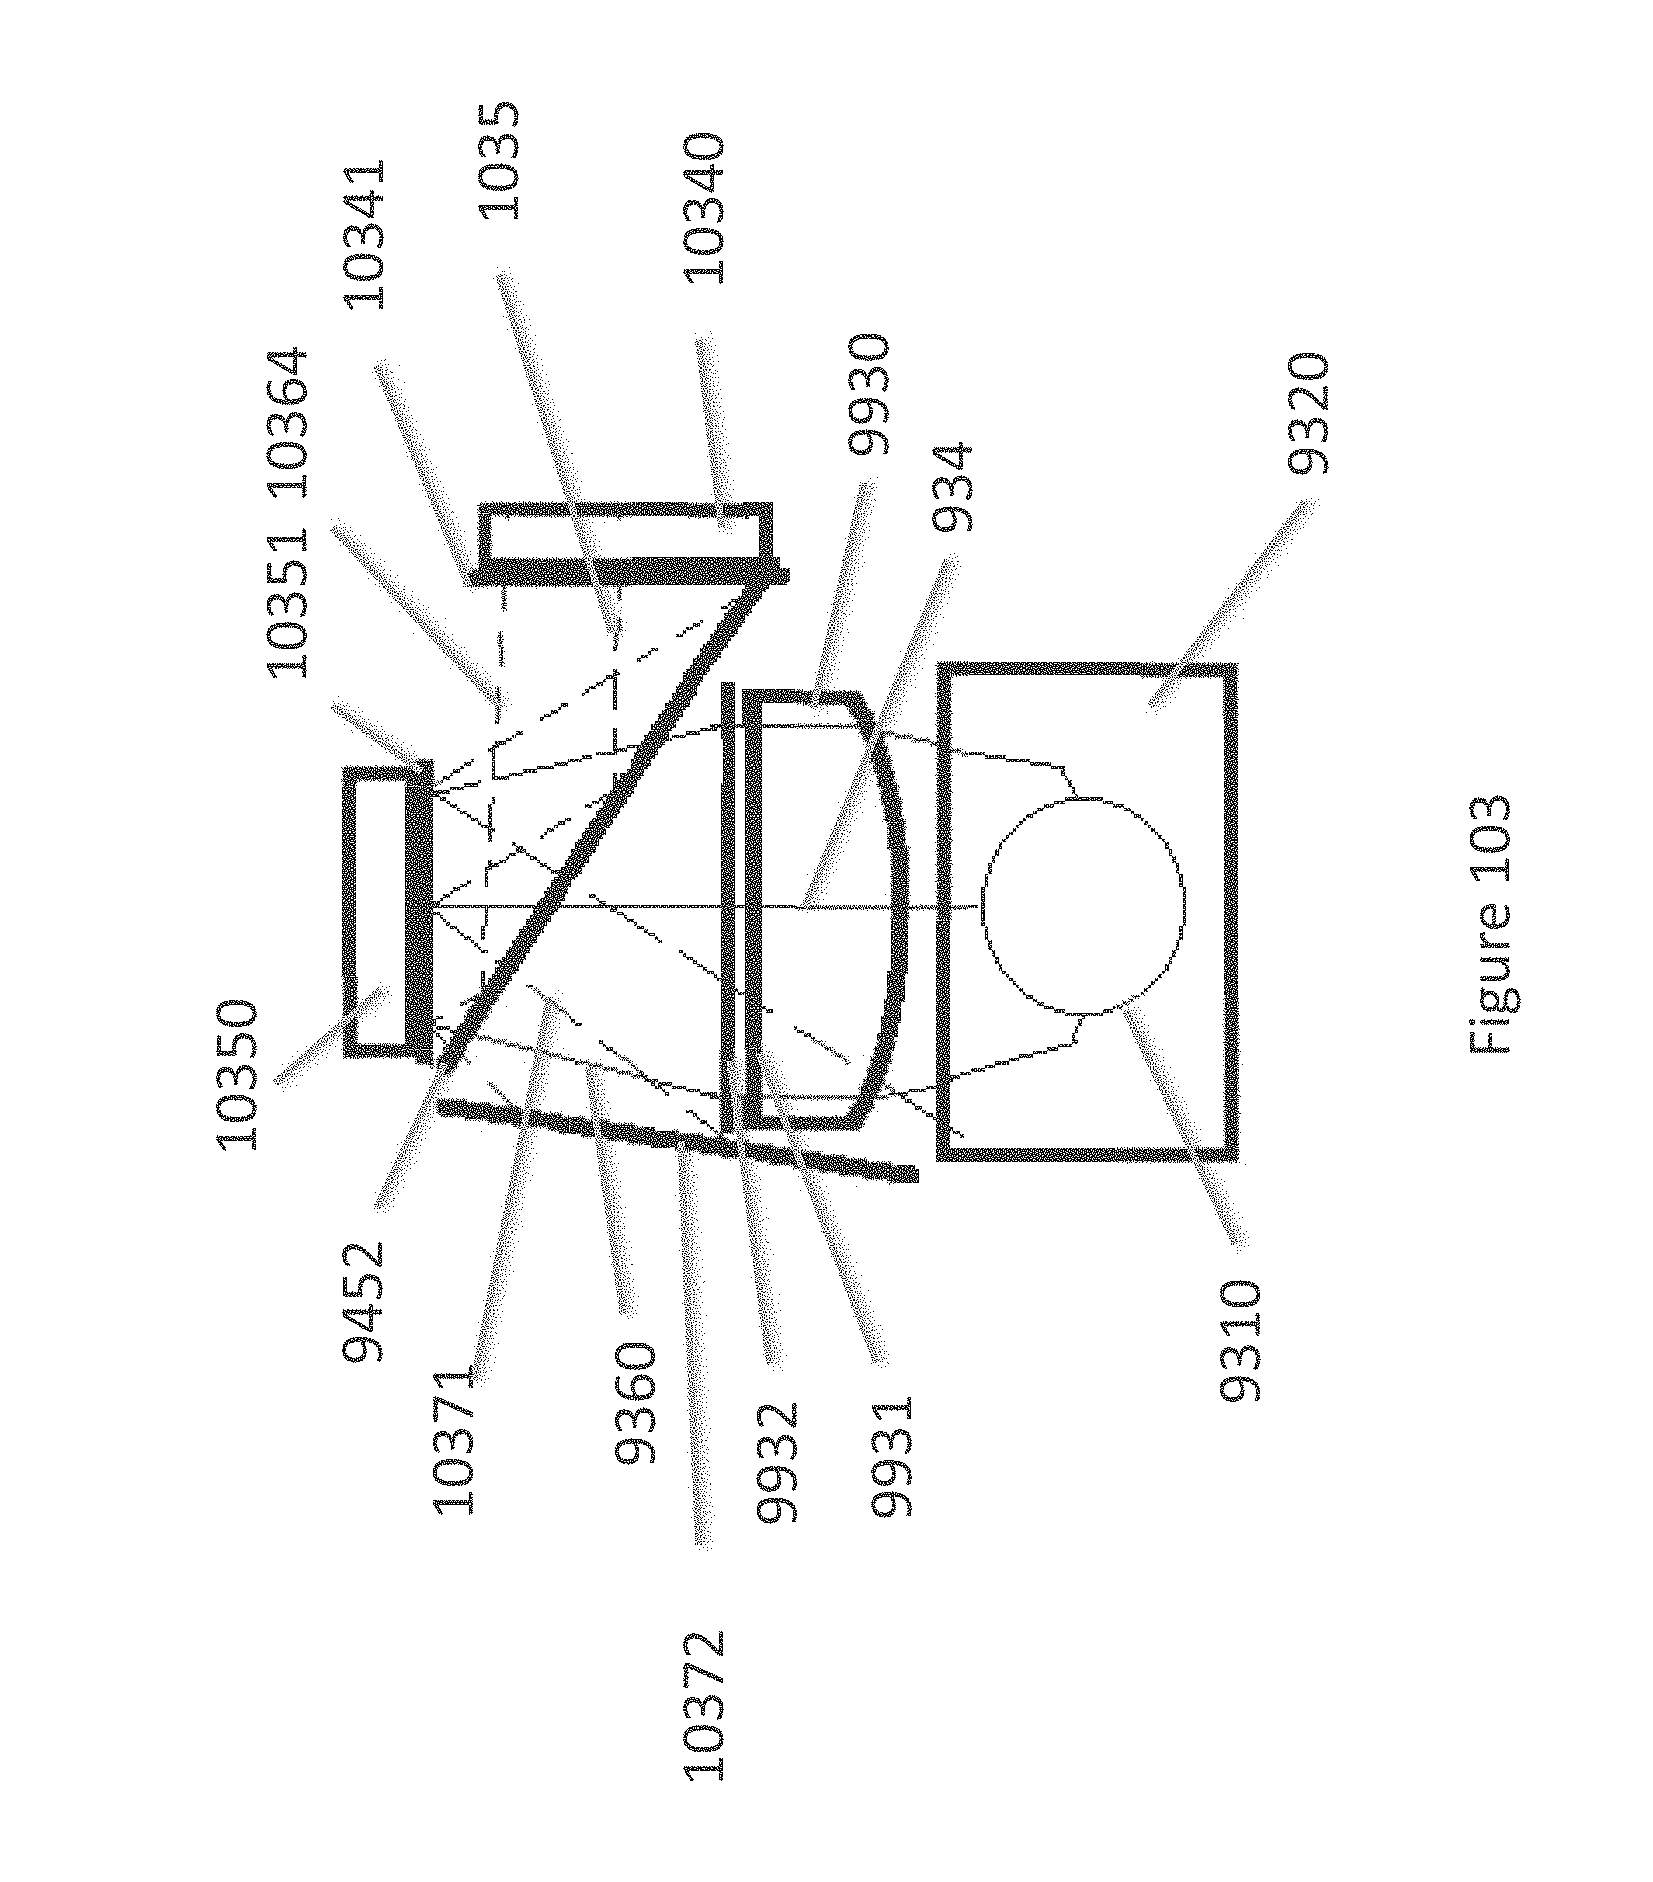 Patent US 9,753,288 B2